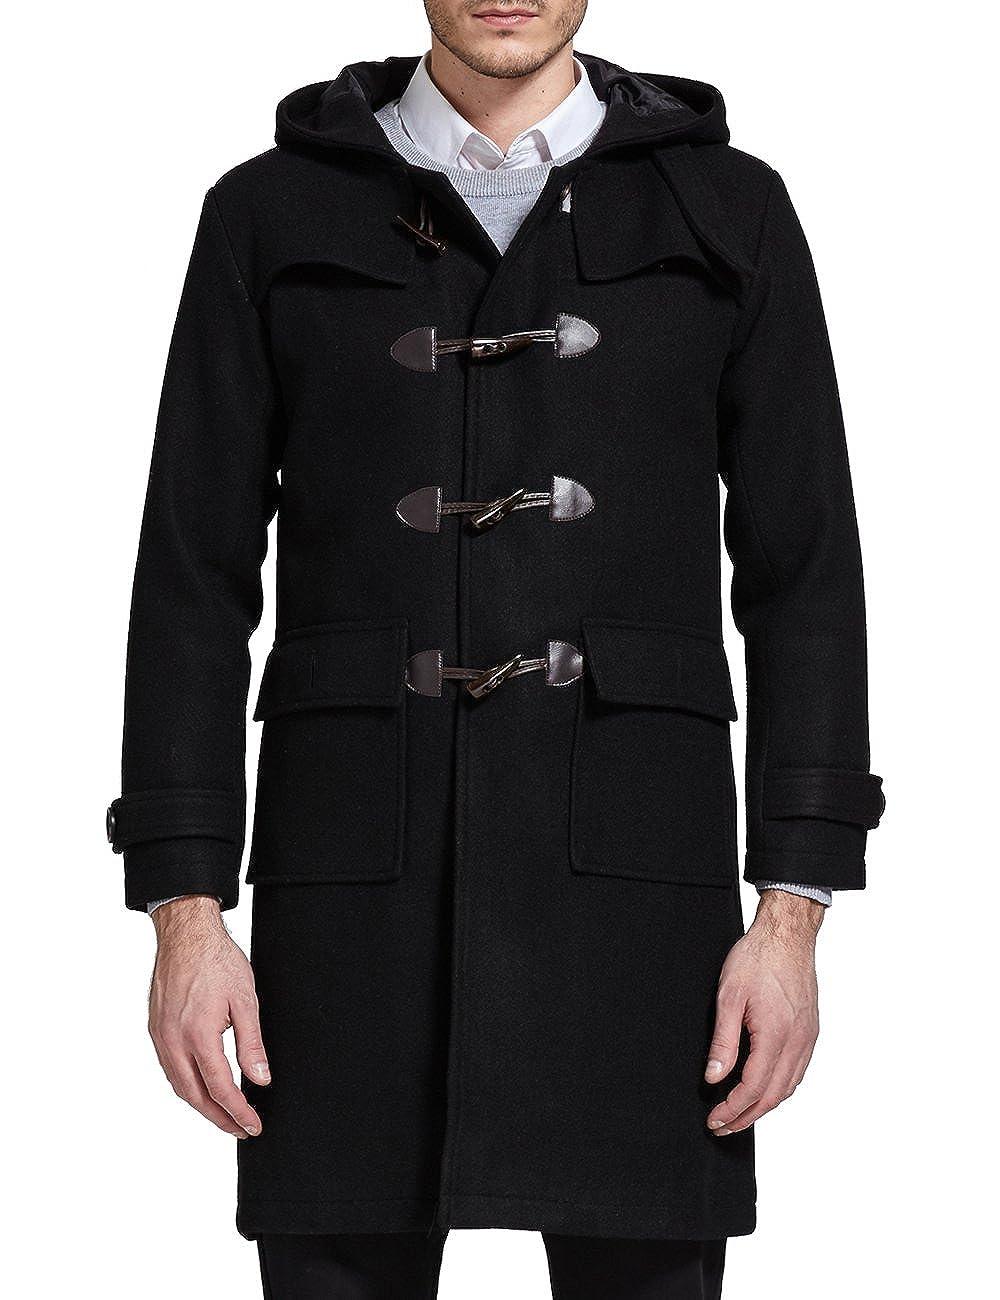 SSLR Men's Woolen Blend Hooded Toggle Coat SN-W18-M-905